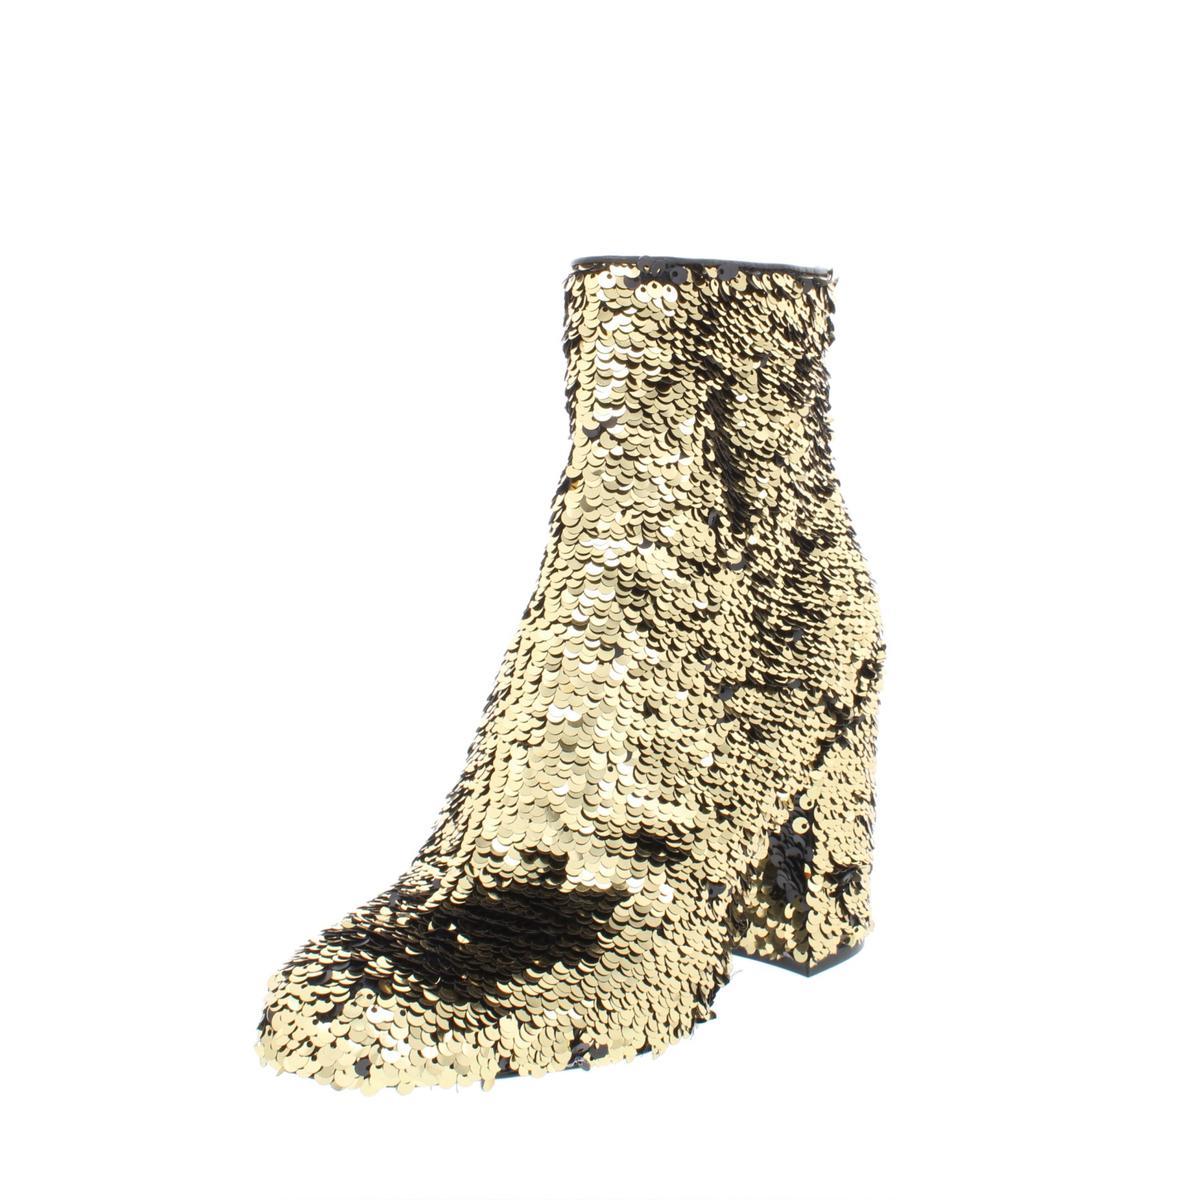 9620f2efa72 Details about Steve Madden Womens Georgia Gold Sequin Booties Heels 5.5  Medium (B